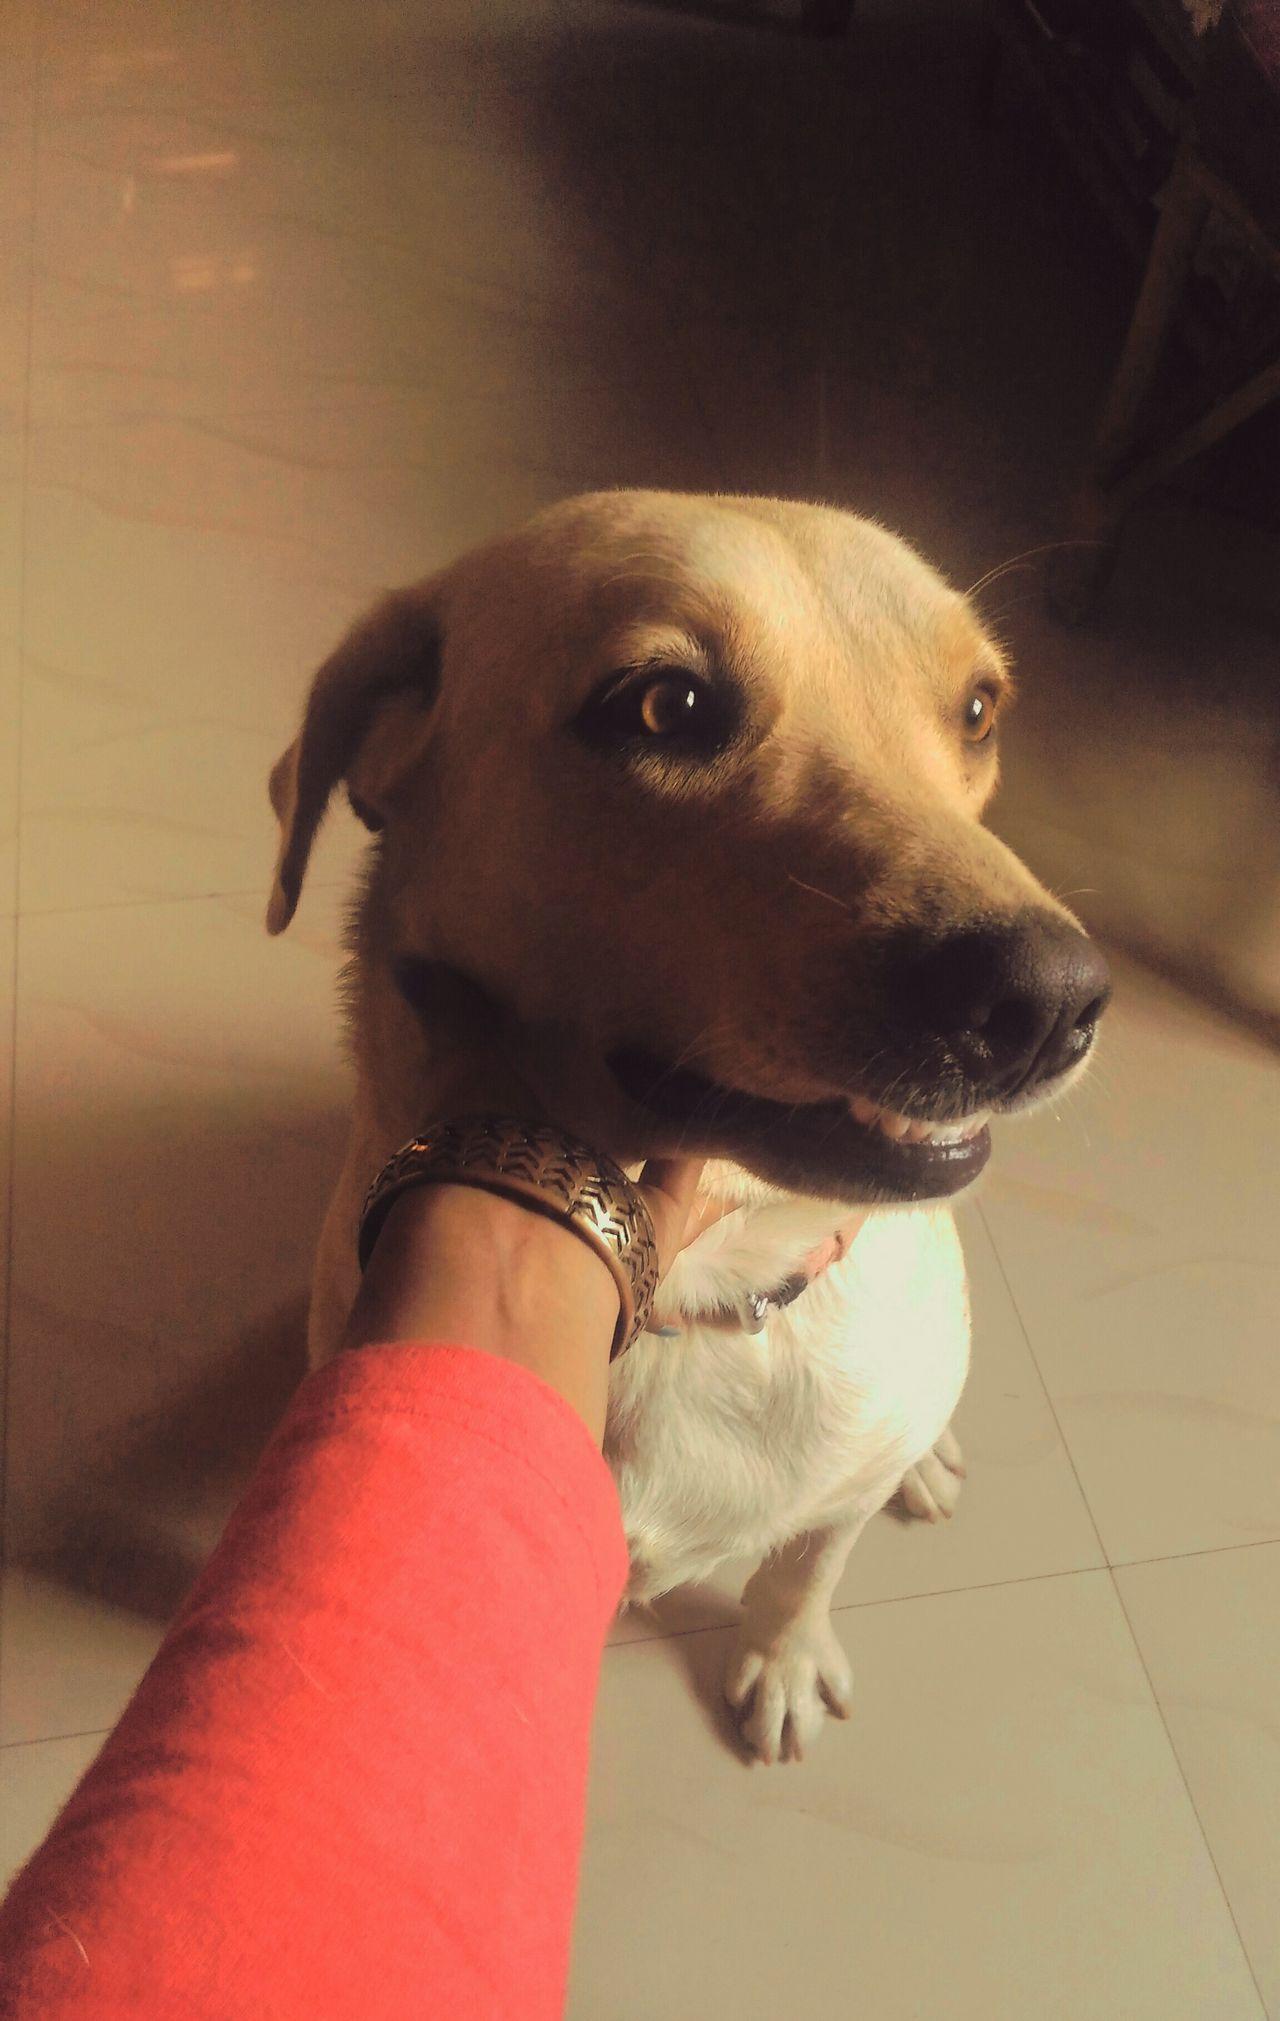 Dog Doggy Love Love ♥ Doggy Love Pet Animallovers